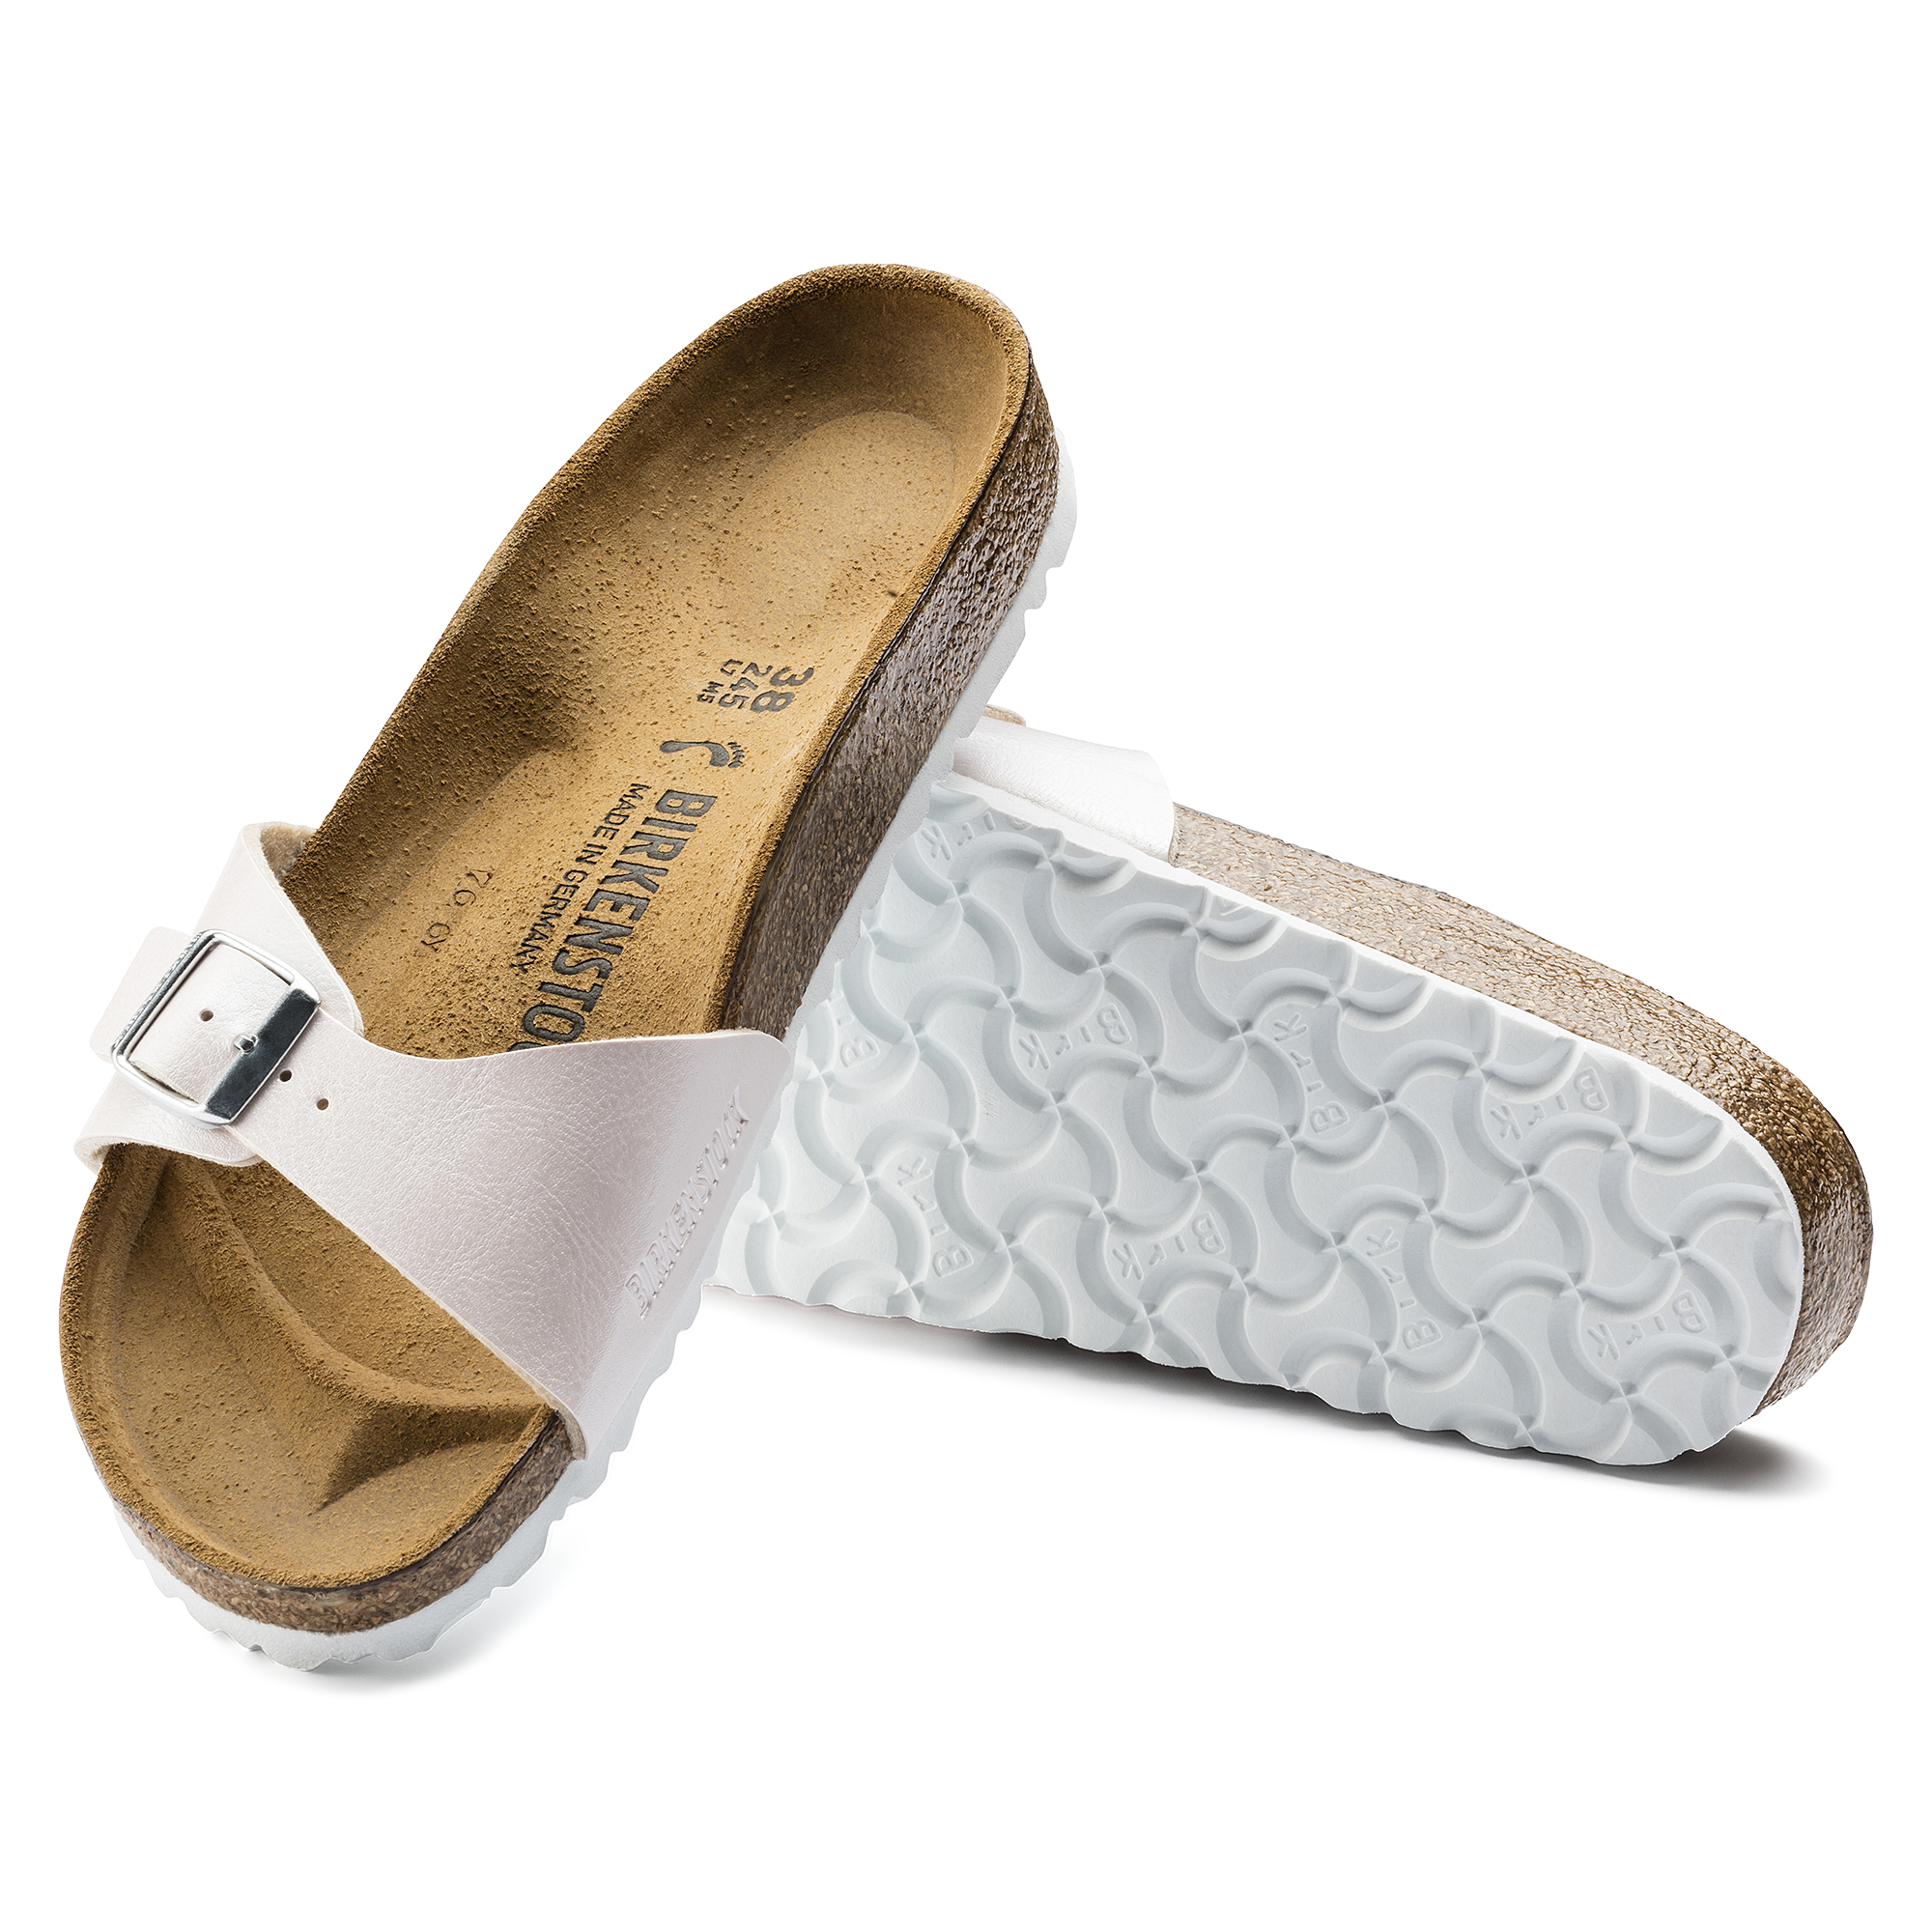 Birkenstock MADRID Damen Sandalette Pantolette 1006377 gracefulmauve , Größe:41 EU